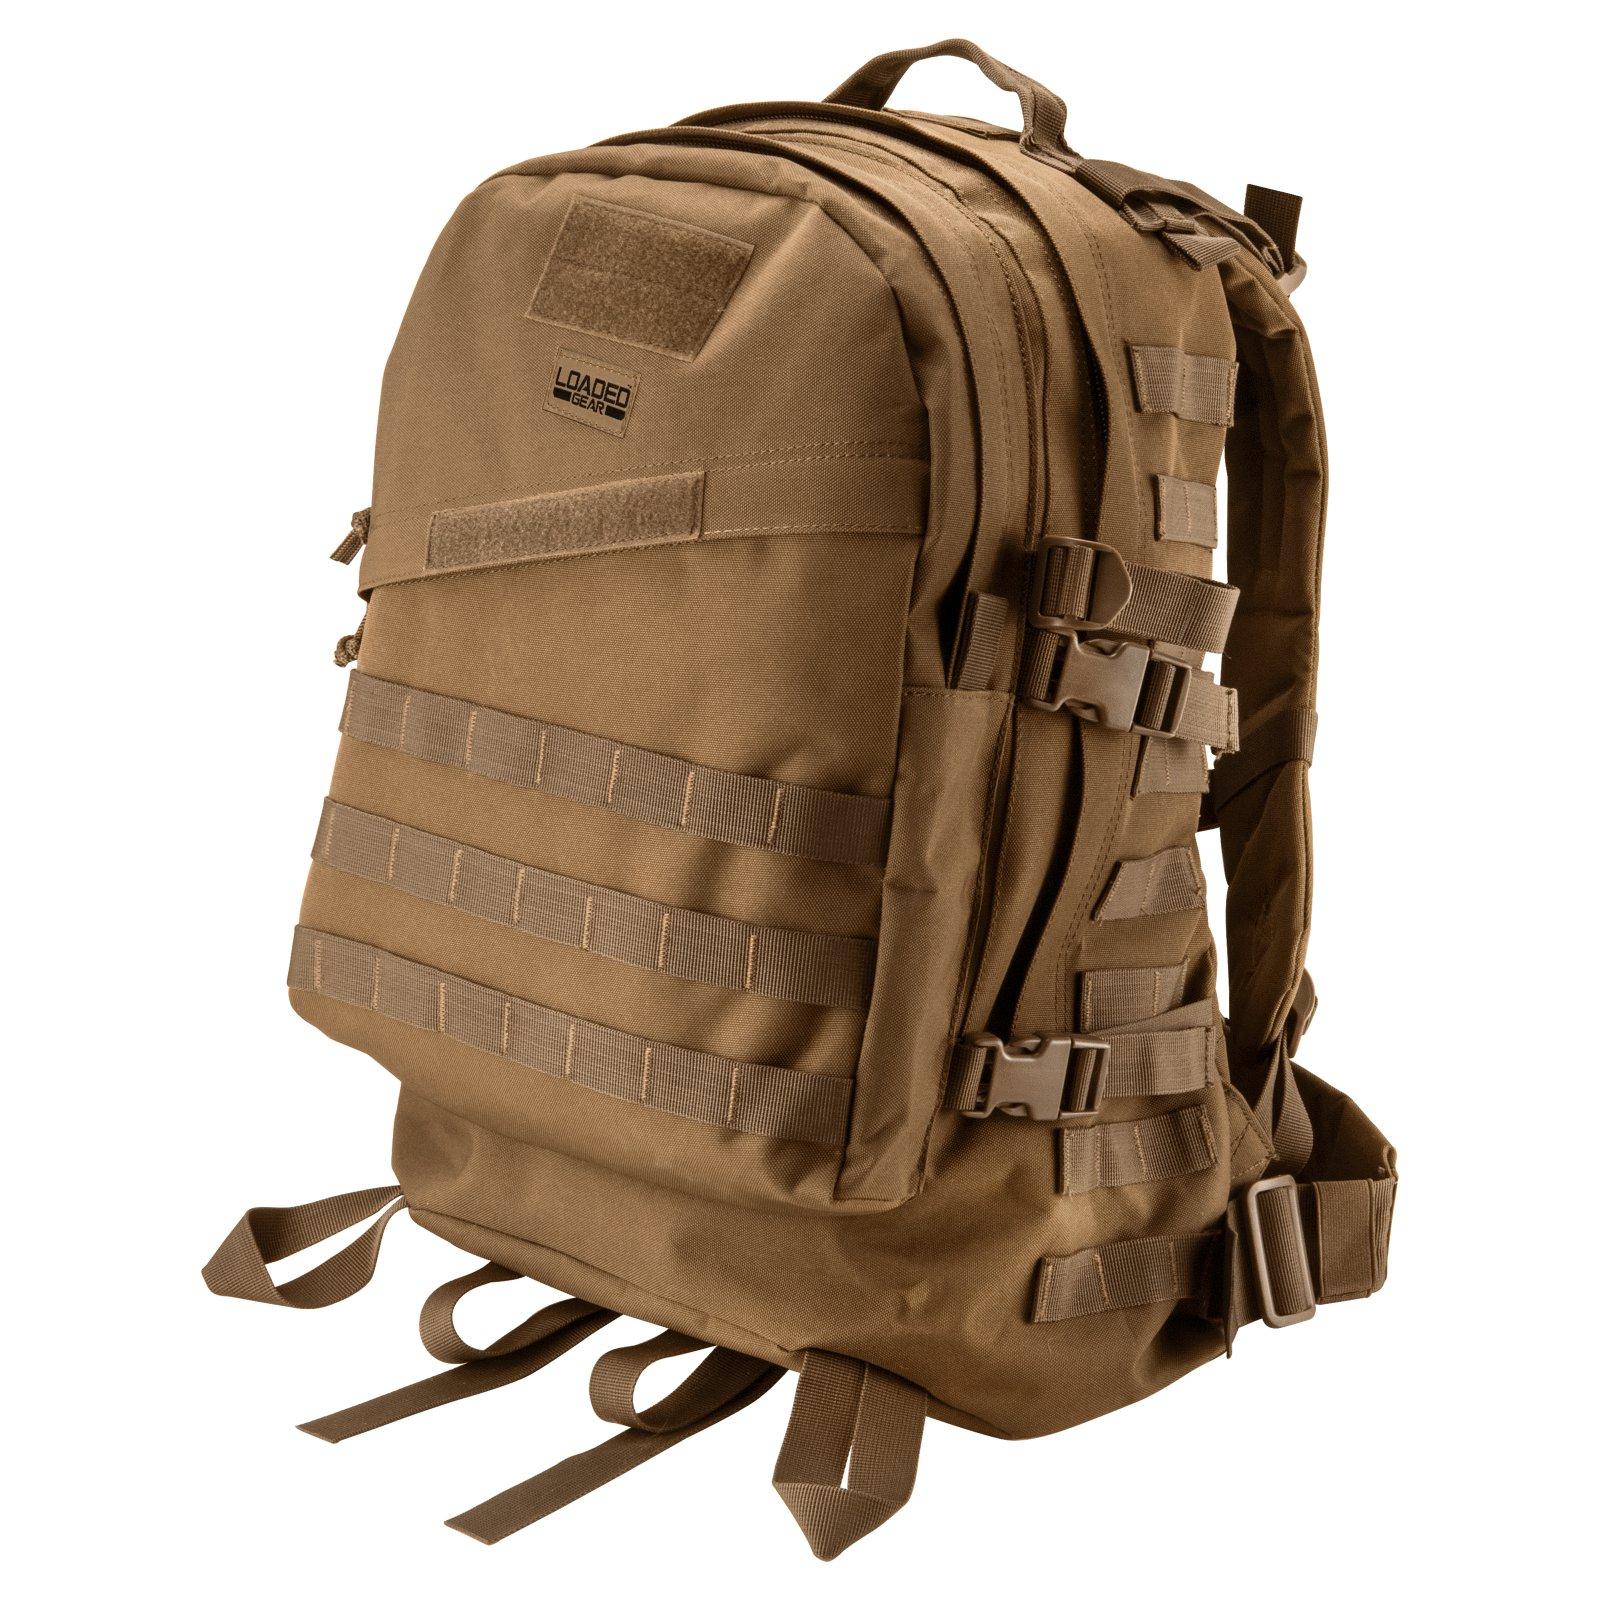 Loaded Gear by Barska GX-200 Tactical Backpack, Green